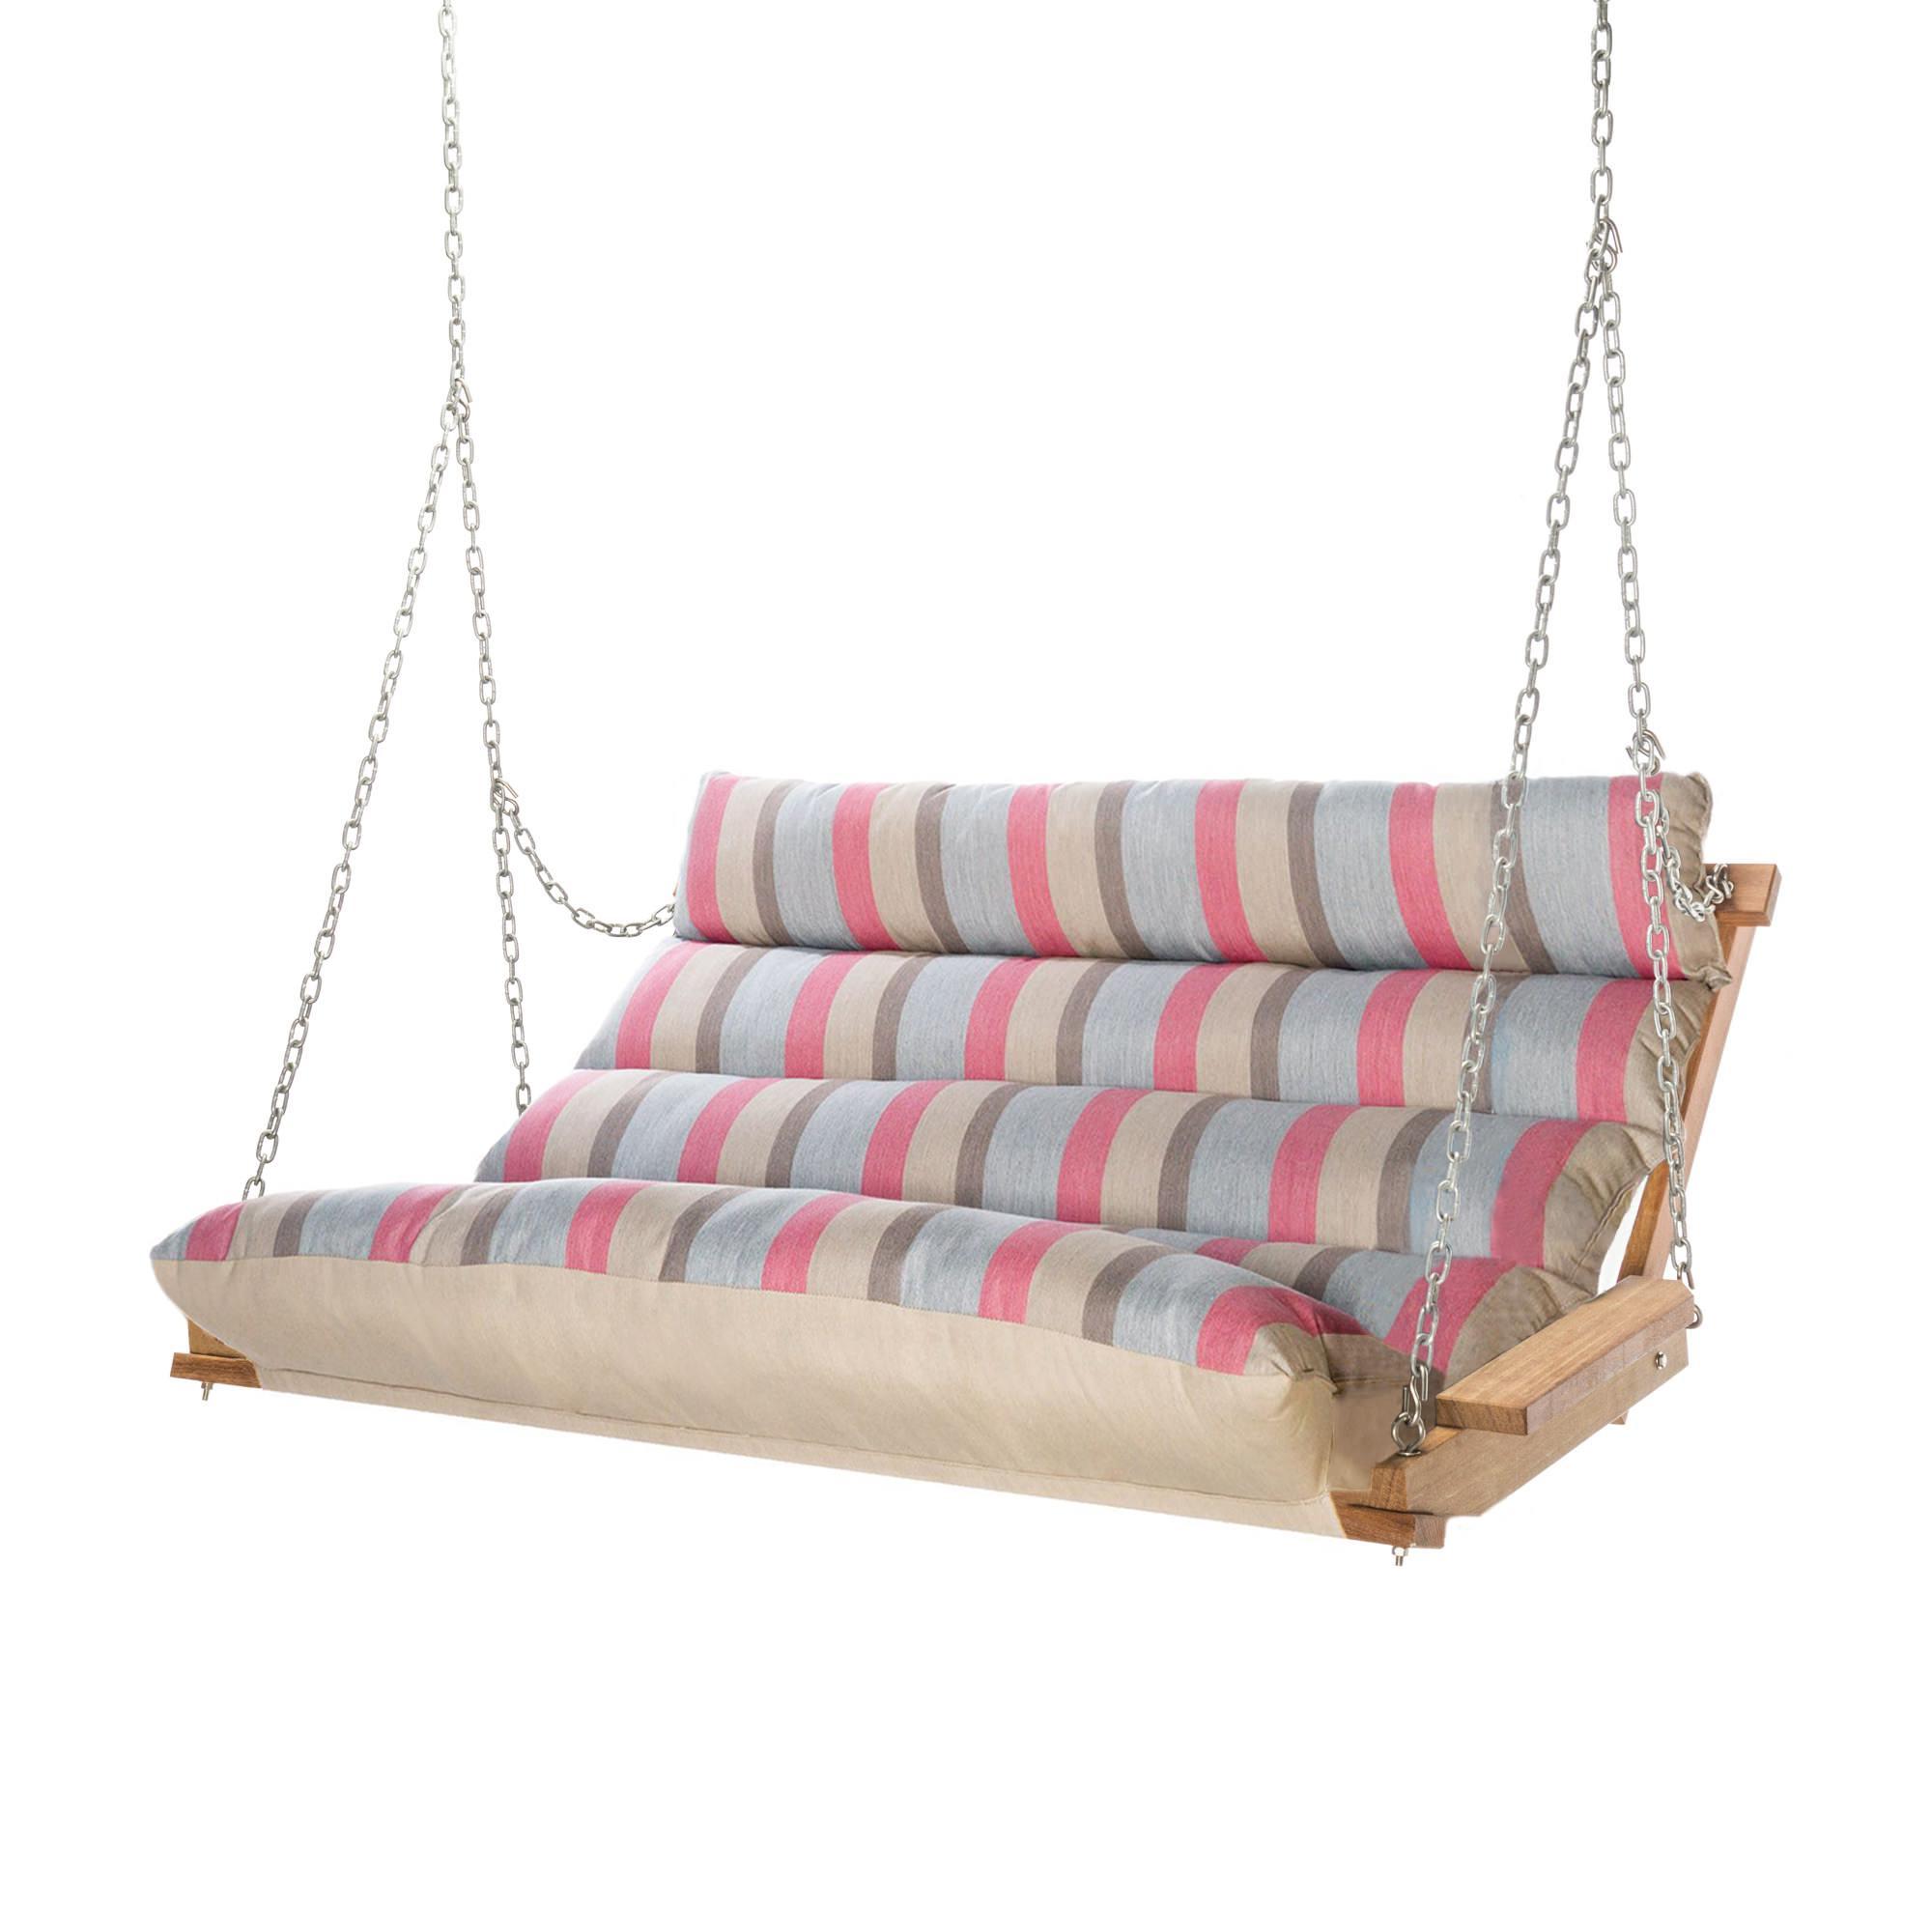 Deluxe Cushion Swing